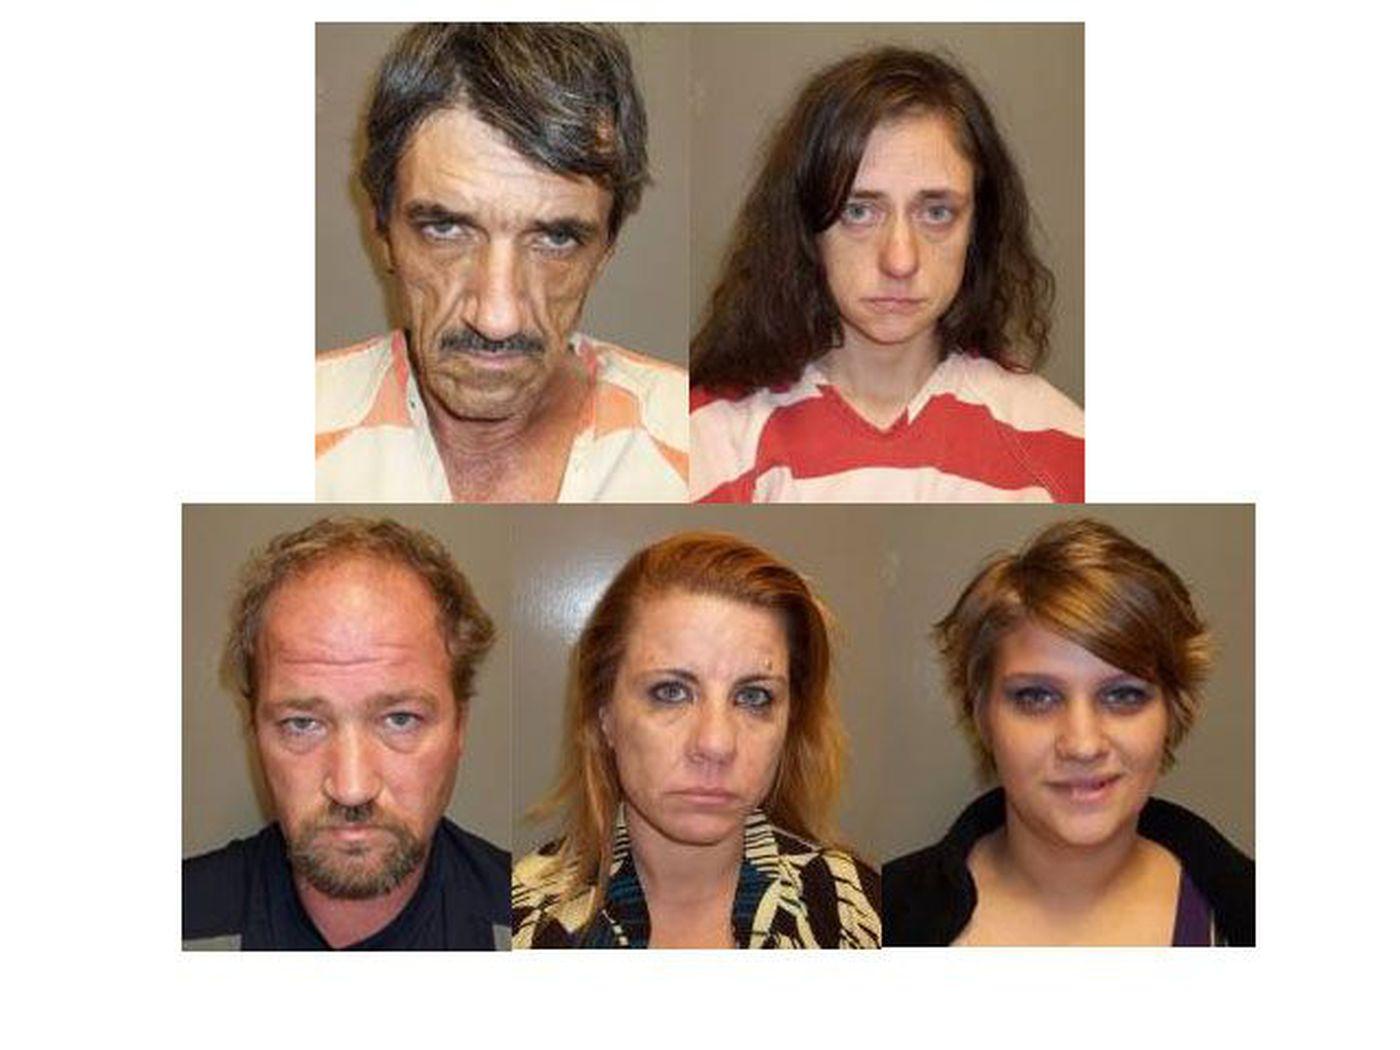 10 arrested in Haughton meth lab bust